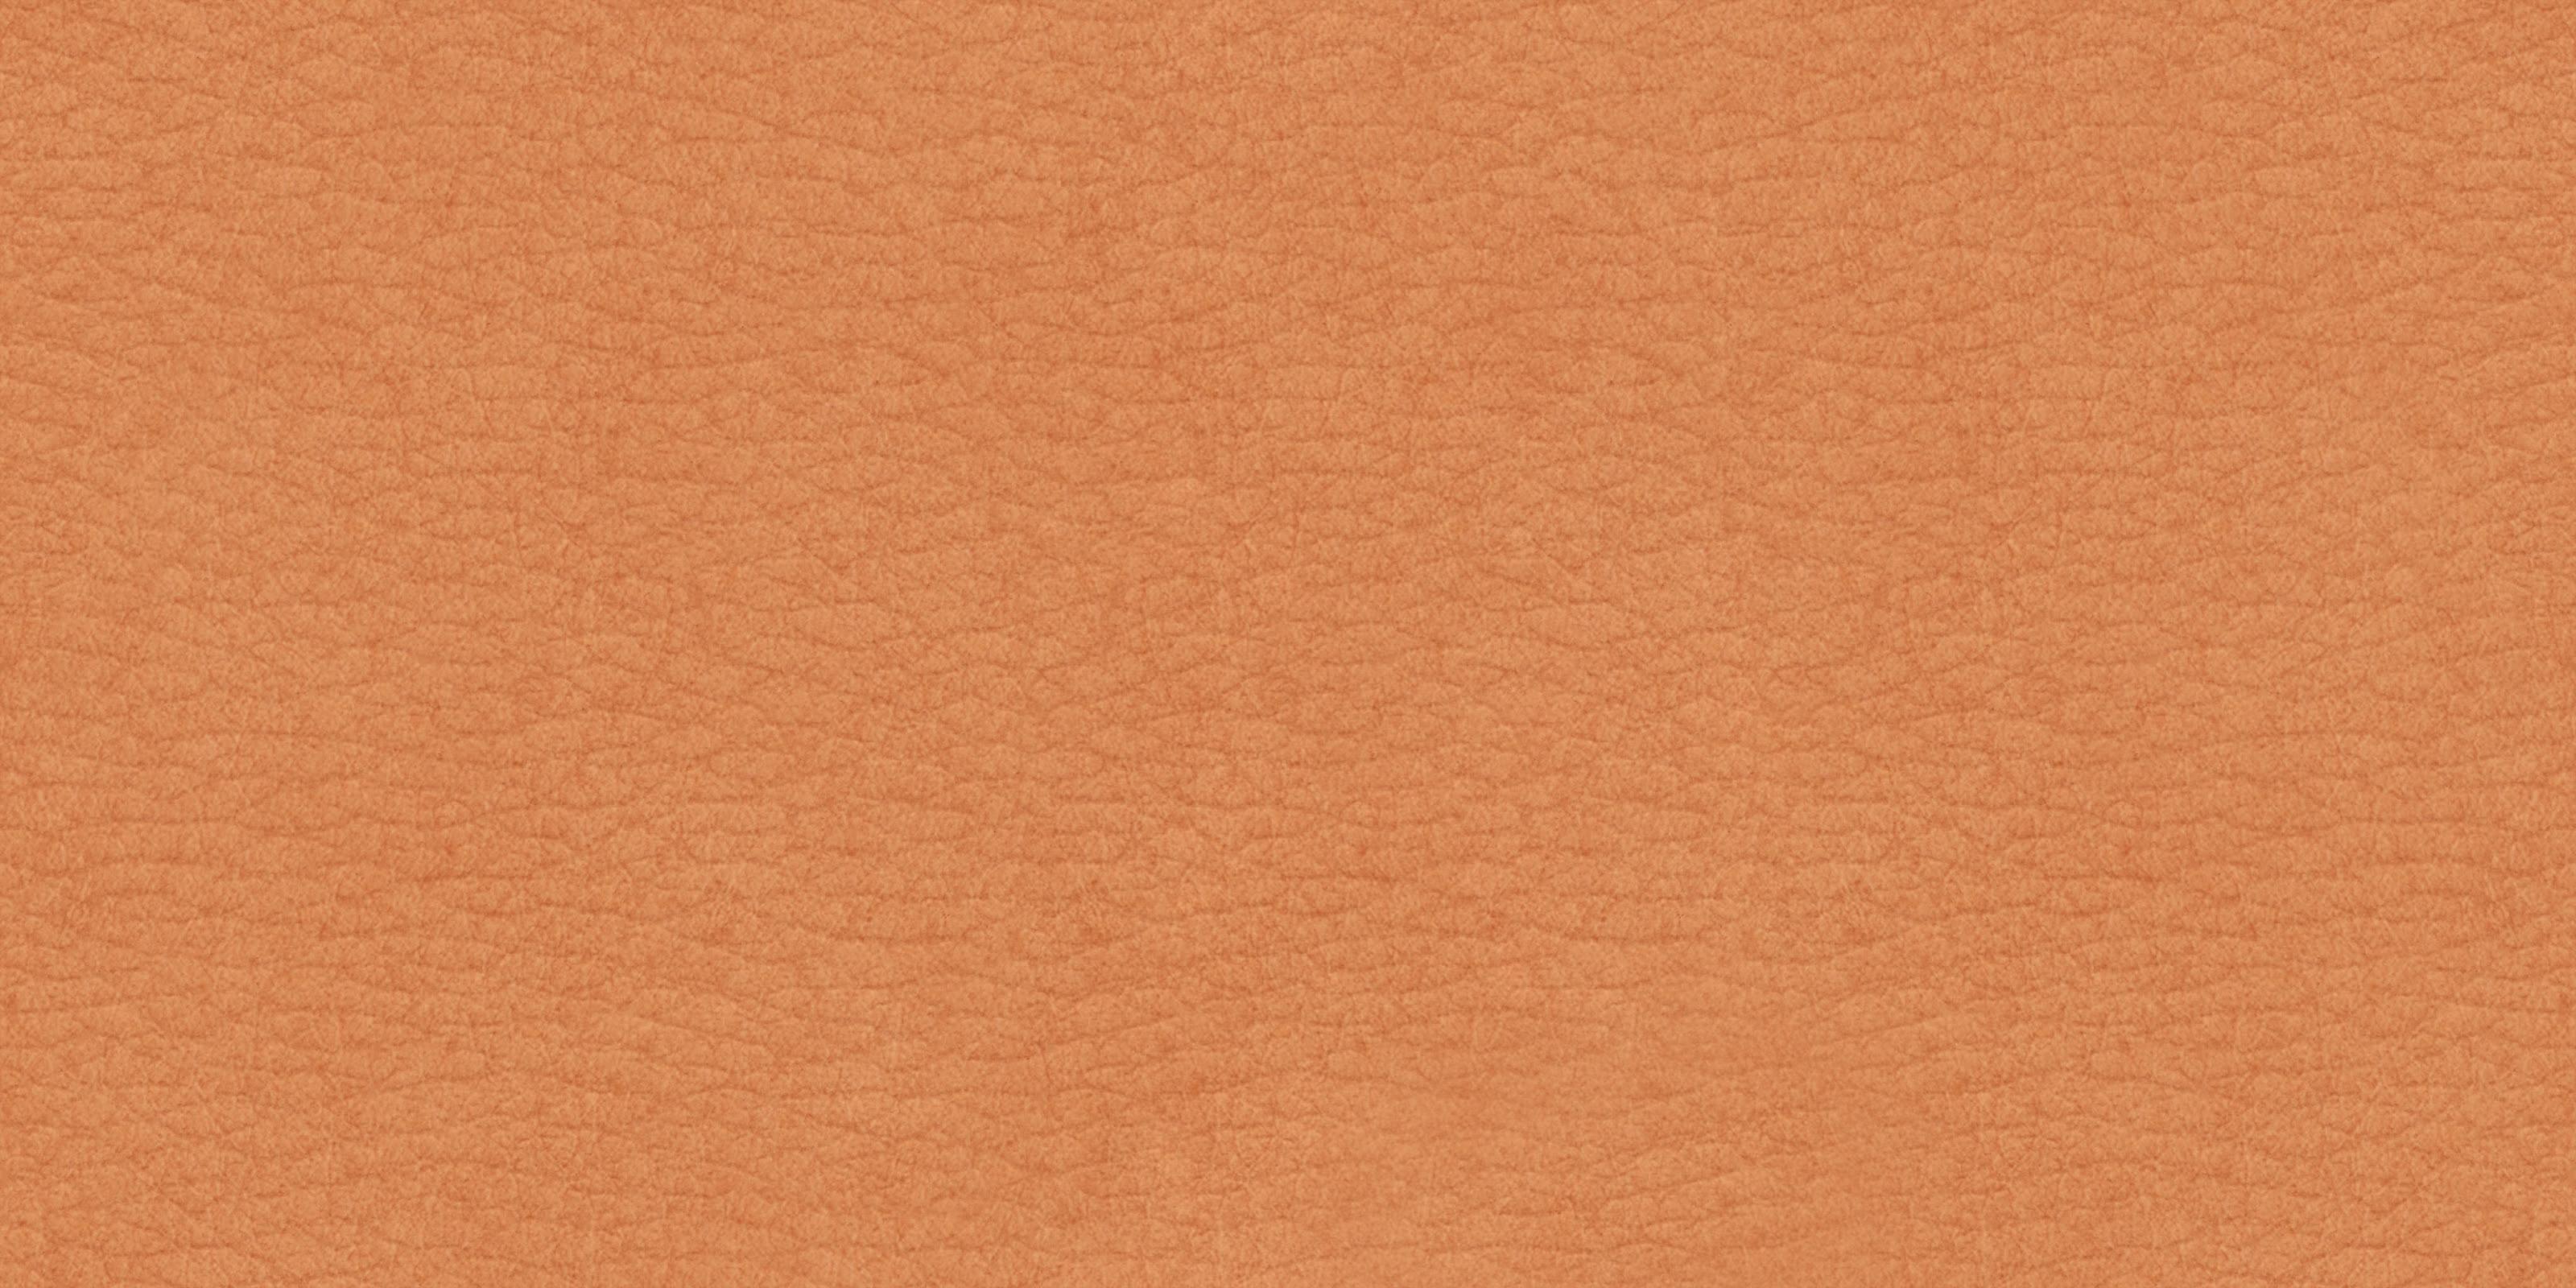 Free Skin Texture